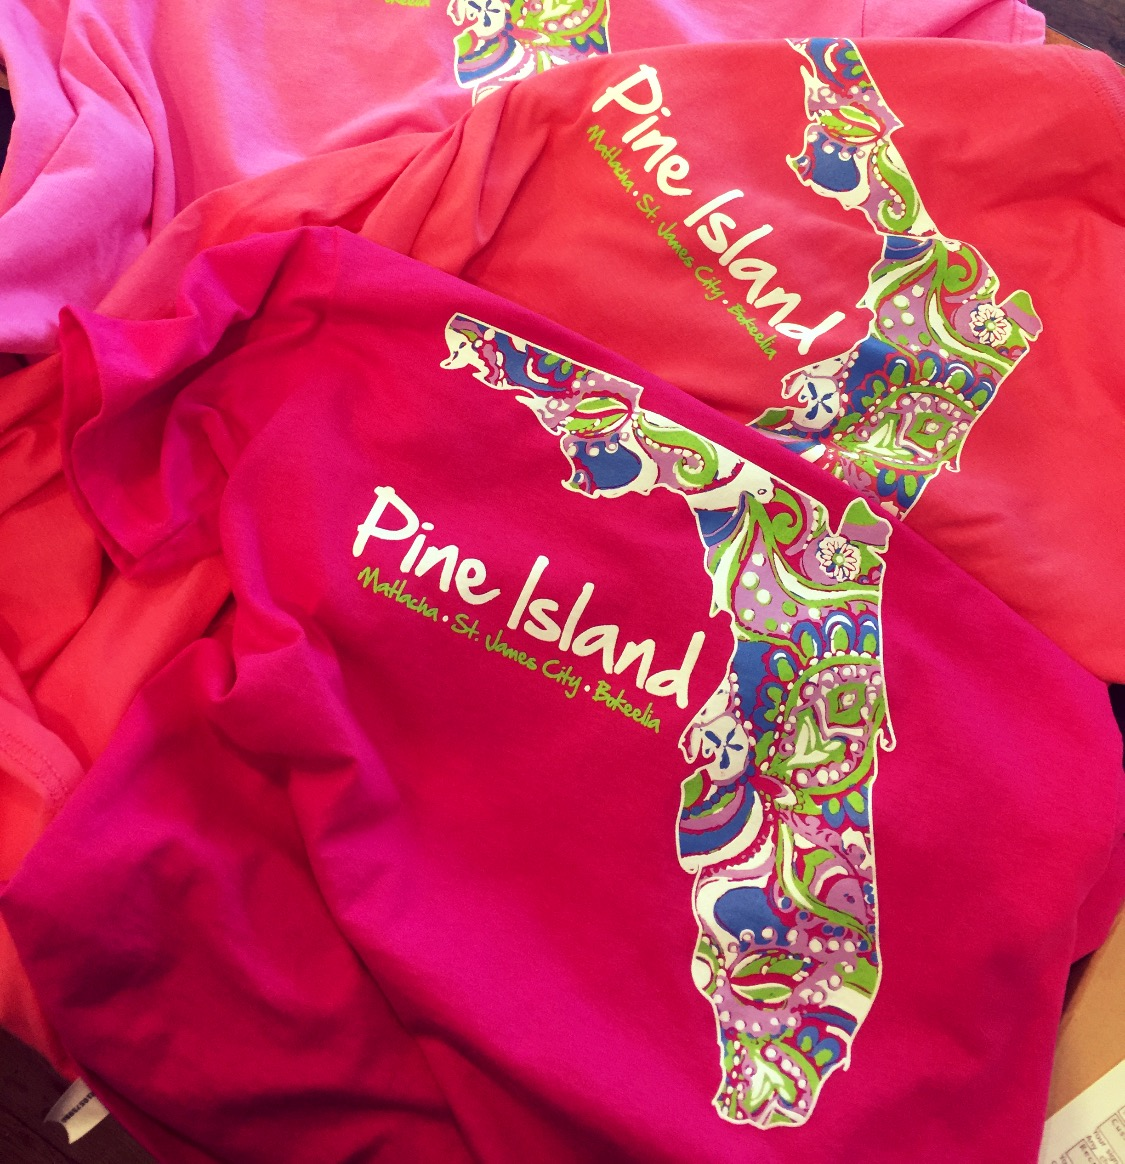 Pine Island Proud